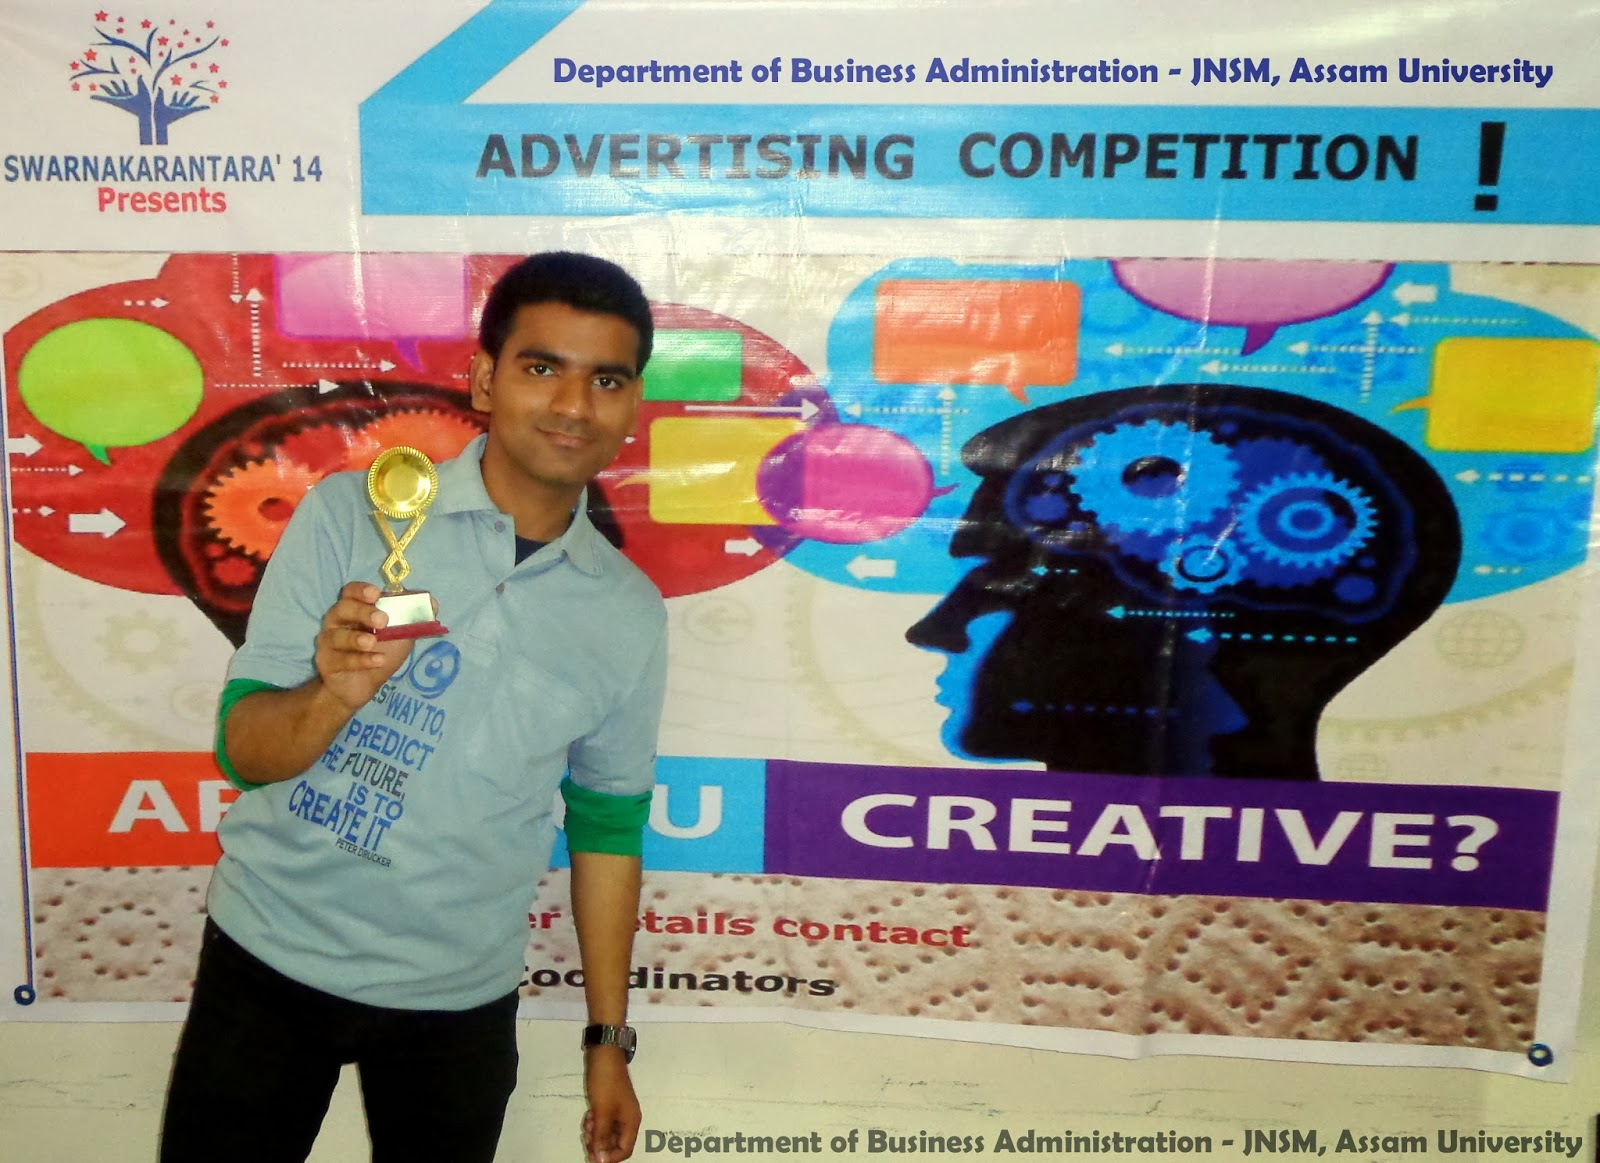 Swarnakarantara'14' | Annual Management Fests | Department of Business Administration - JNSM, AUS